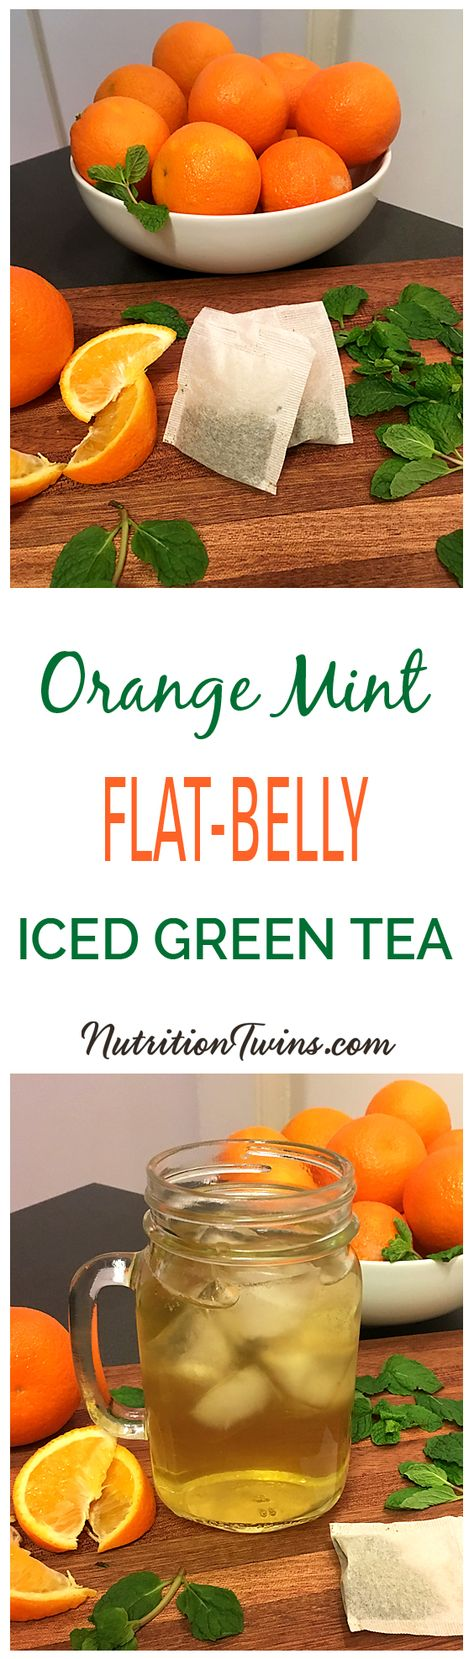 "Orange Mint Iced Green ""Flat- Belly"" Tea"